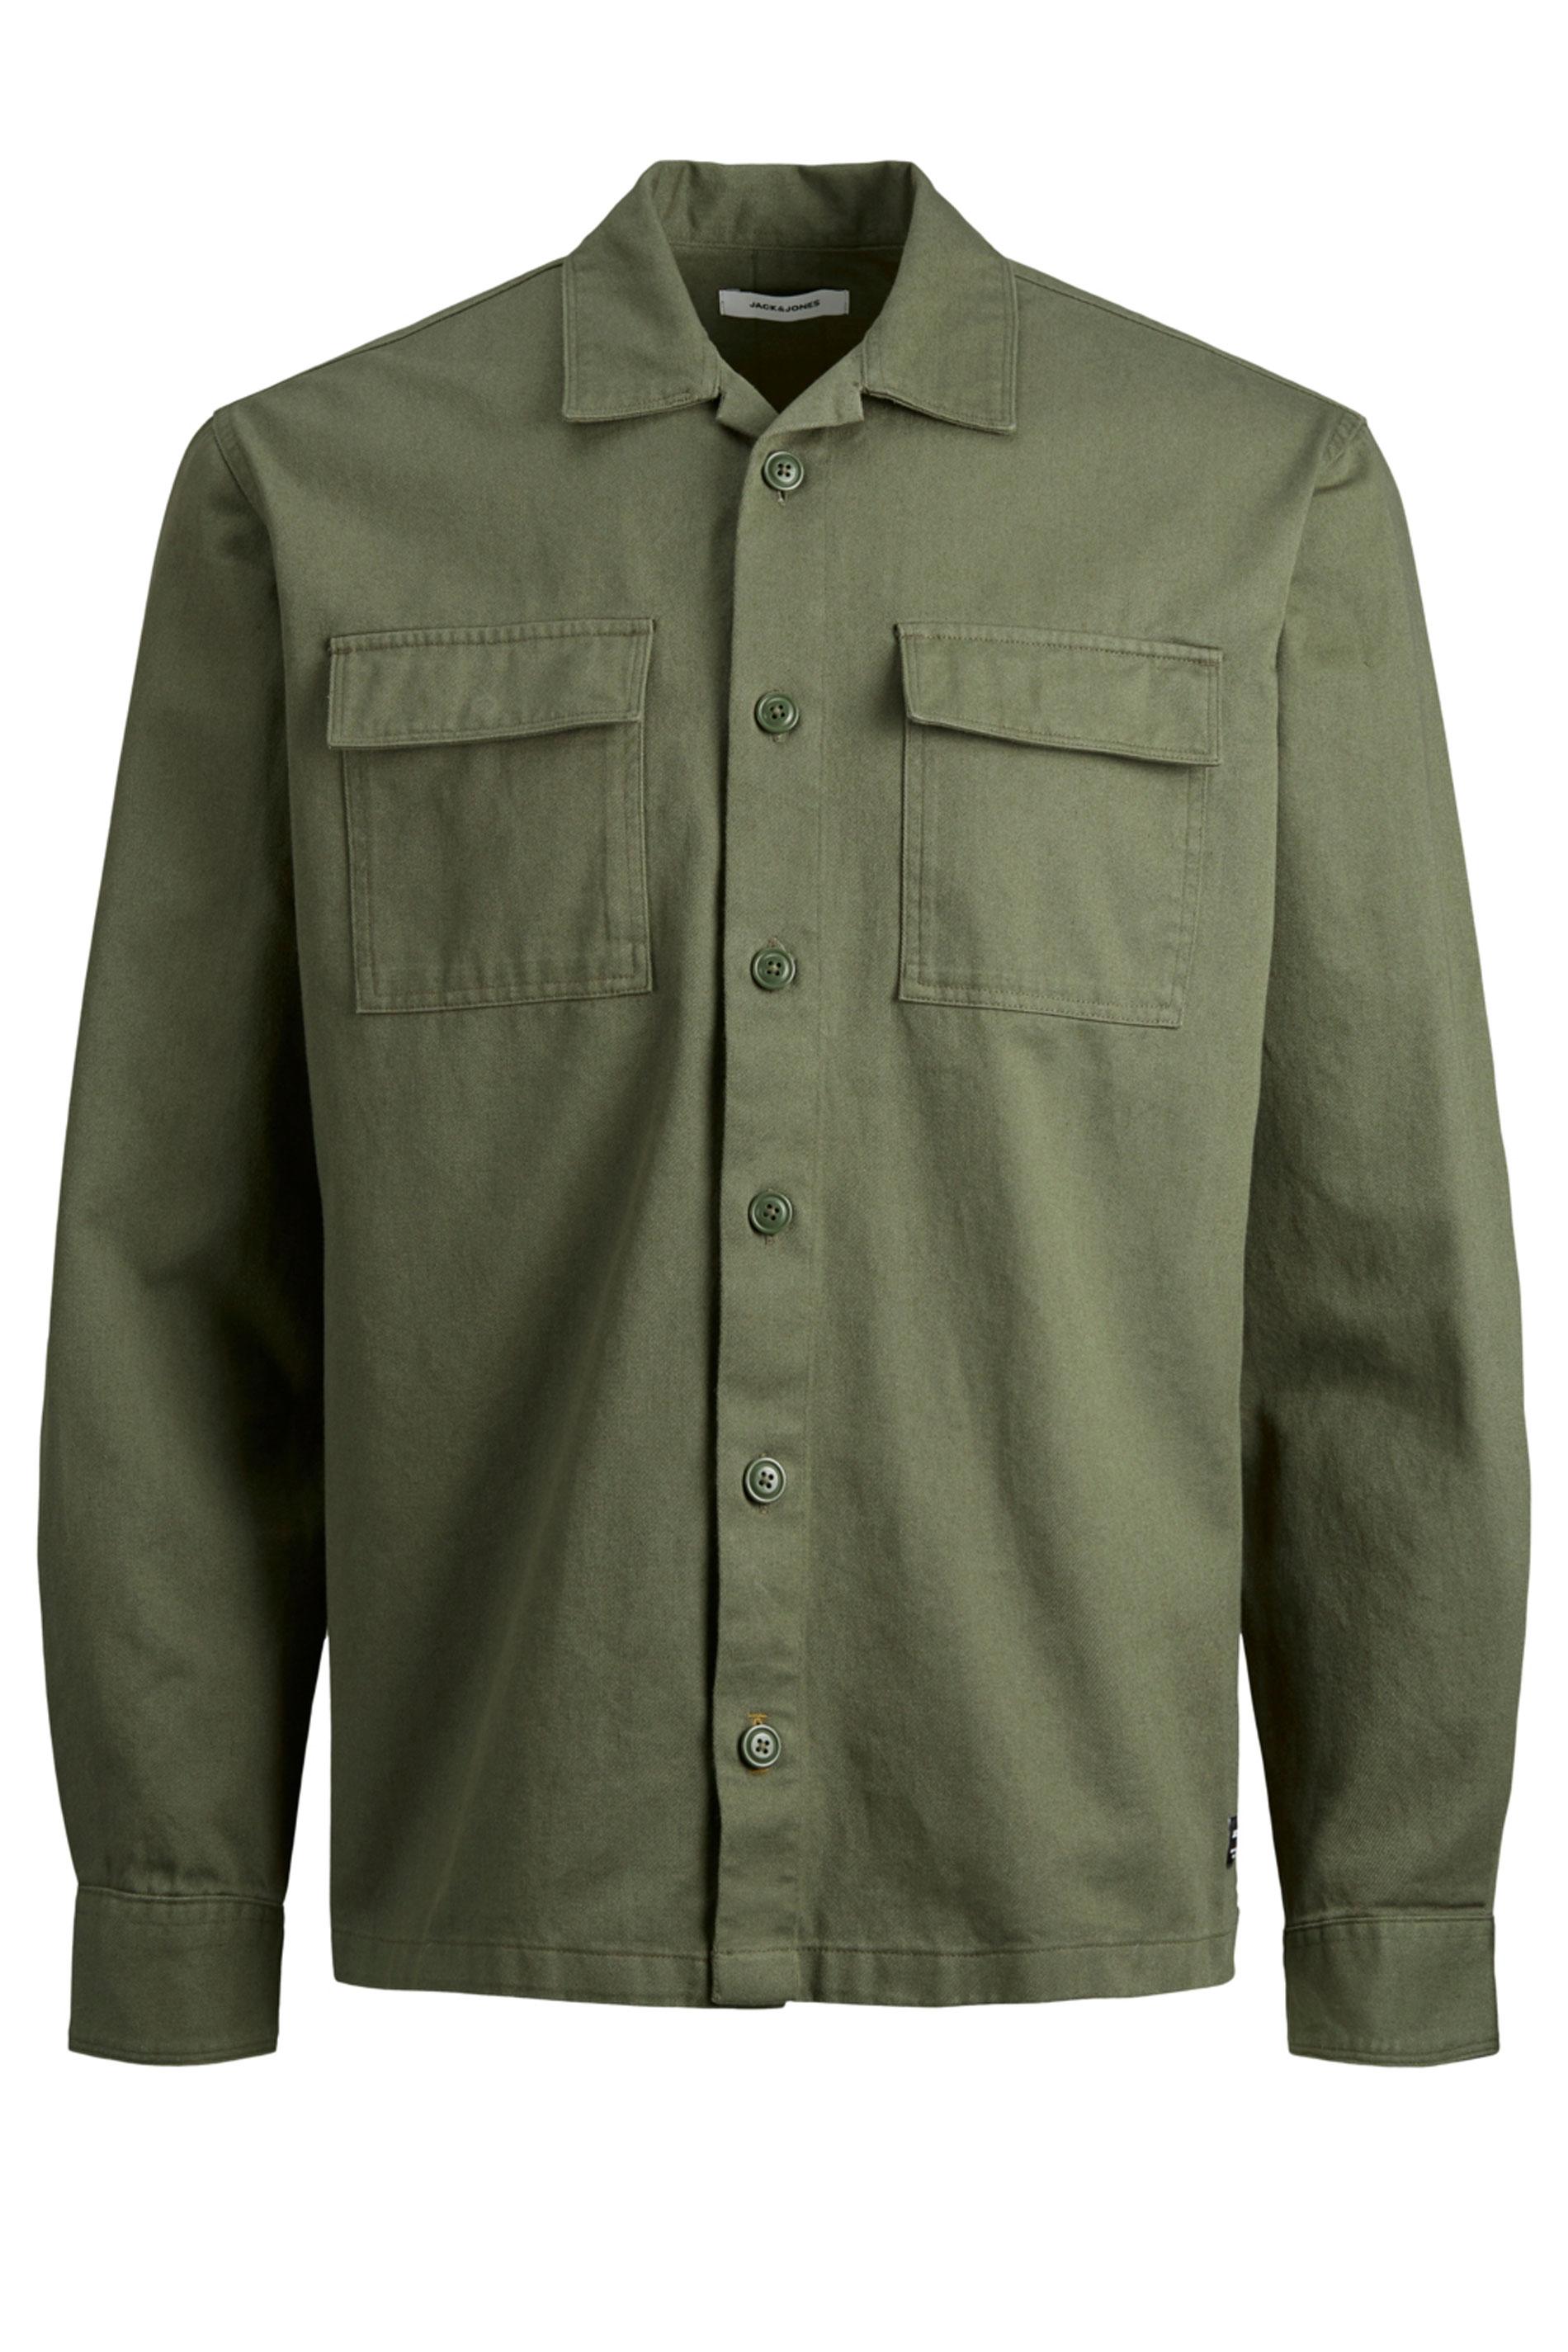 JACK & JONES Khaki Utility Overshirt